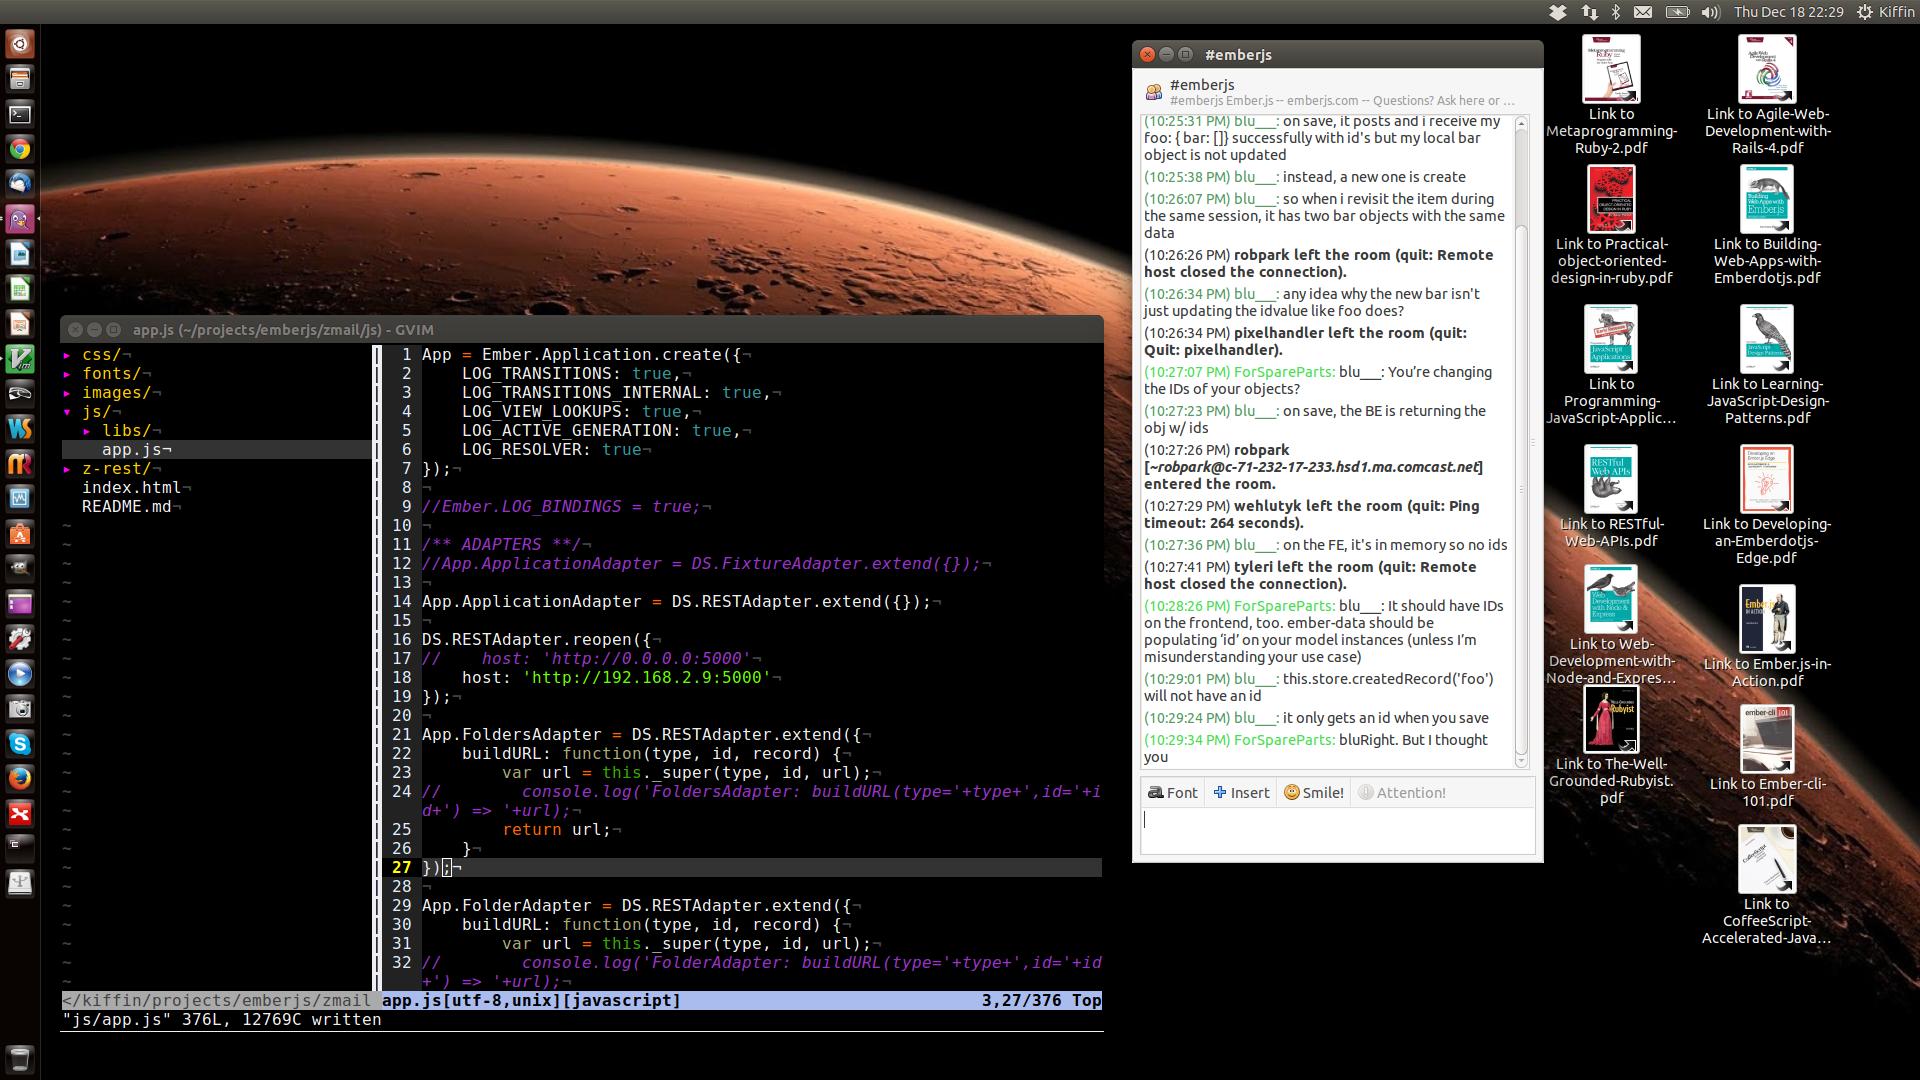 http://www.kiffingish.com/images/desktop-ubuntu-14.04-LTS.png